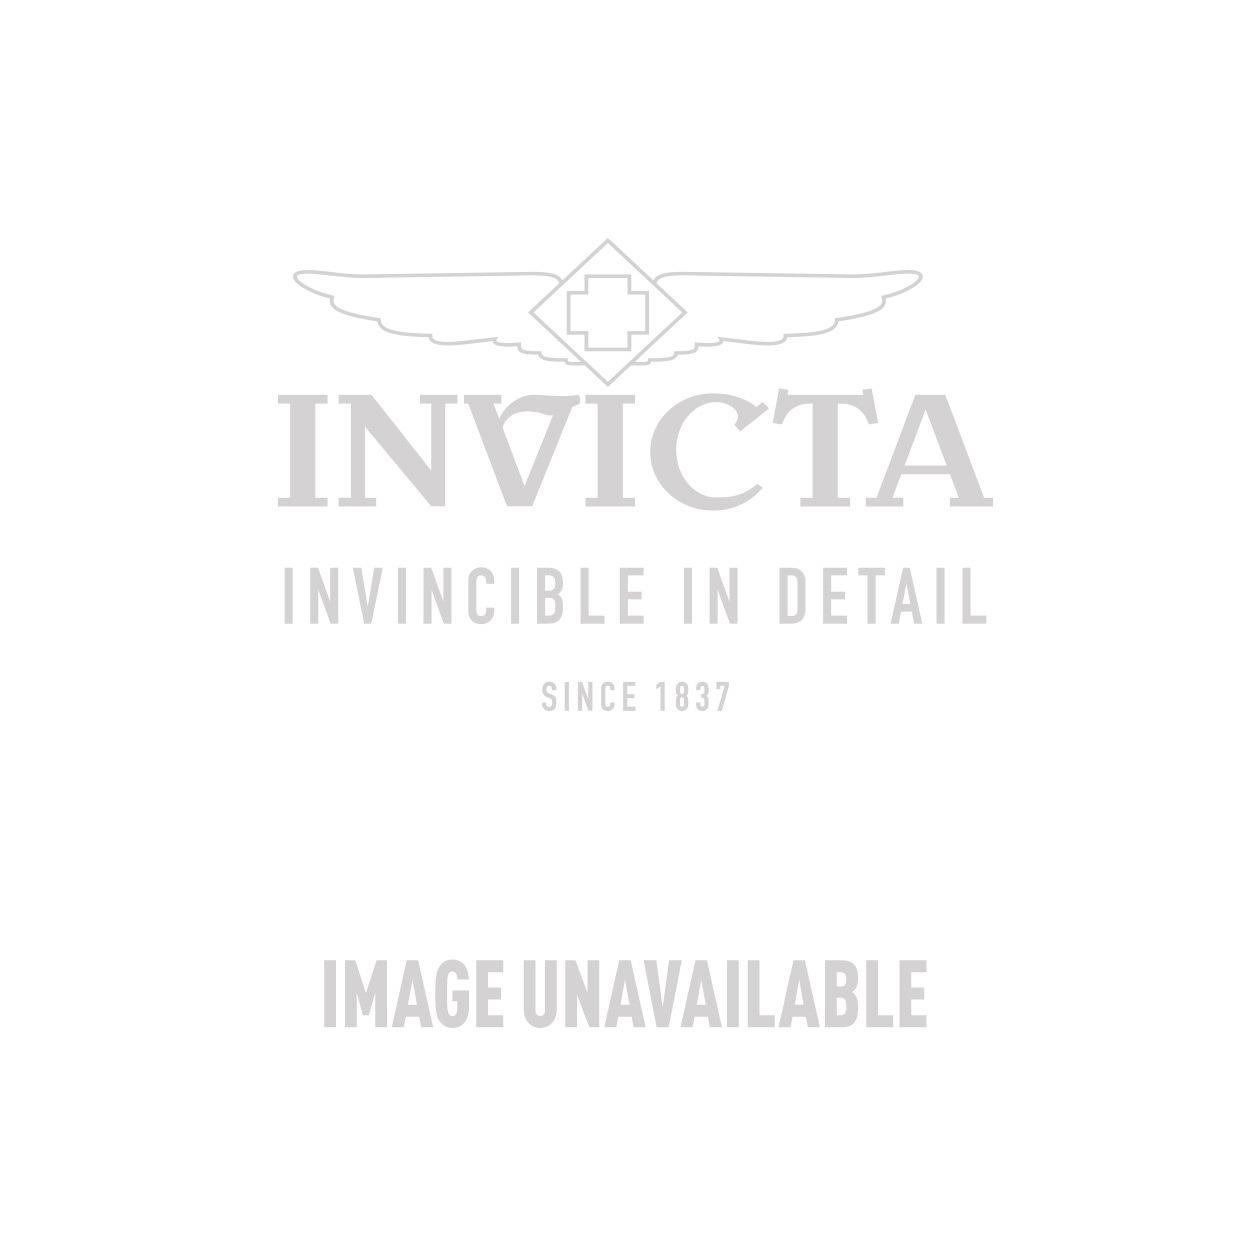 Invicta Corduba Swiss Movement Quartz Watch - Stainless Steel case with Steel, Grey tone Stainless Steel, Polyurethane band - Model 10605